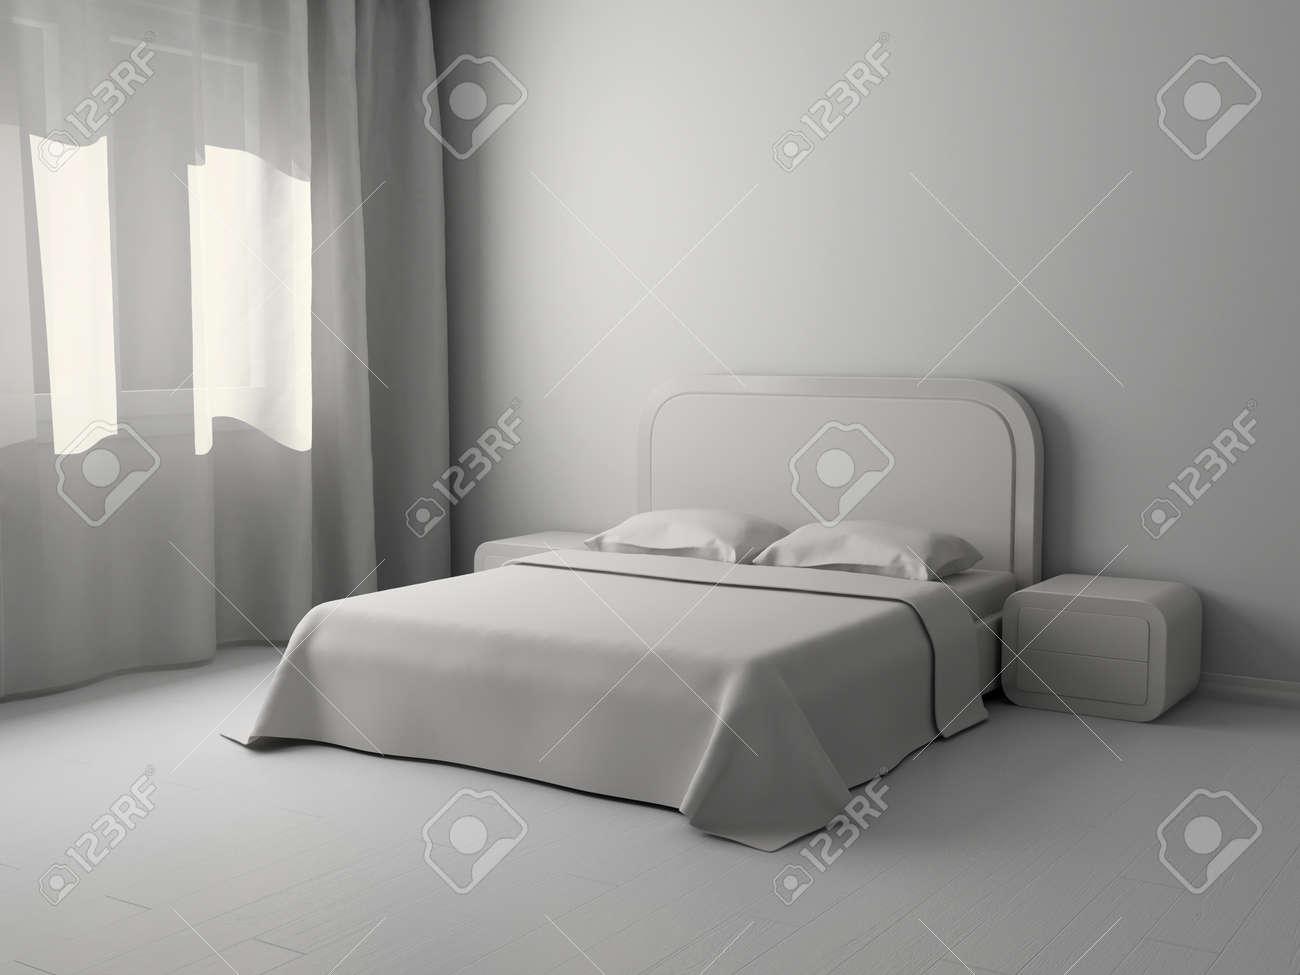 Cabina Armadio Dietro Letto : Cabina armadio dietro al letto cabine armadio dietro il letto